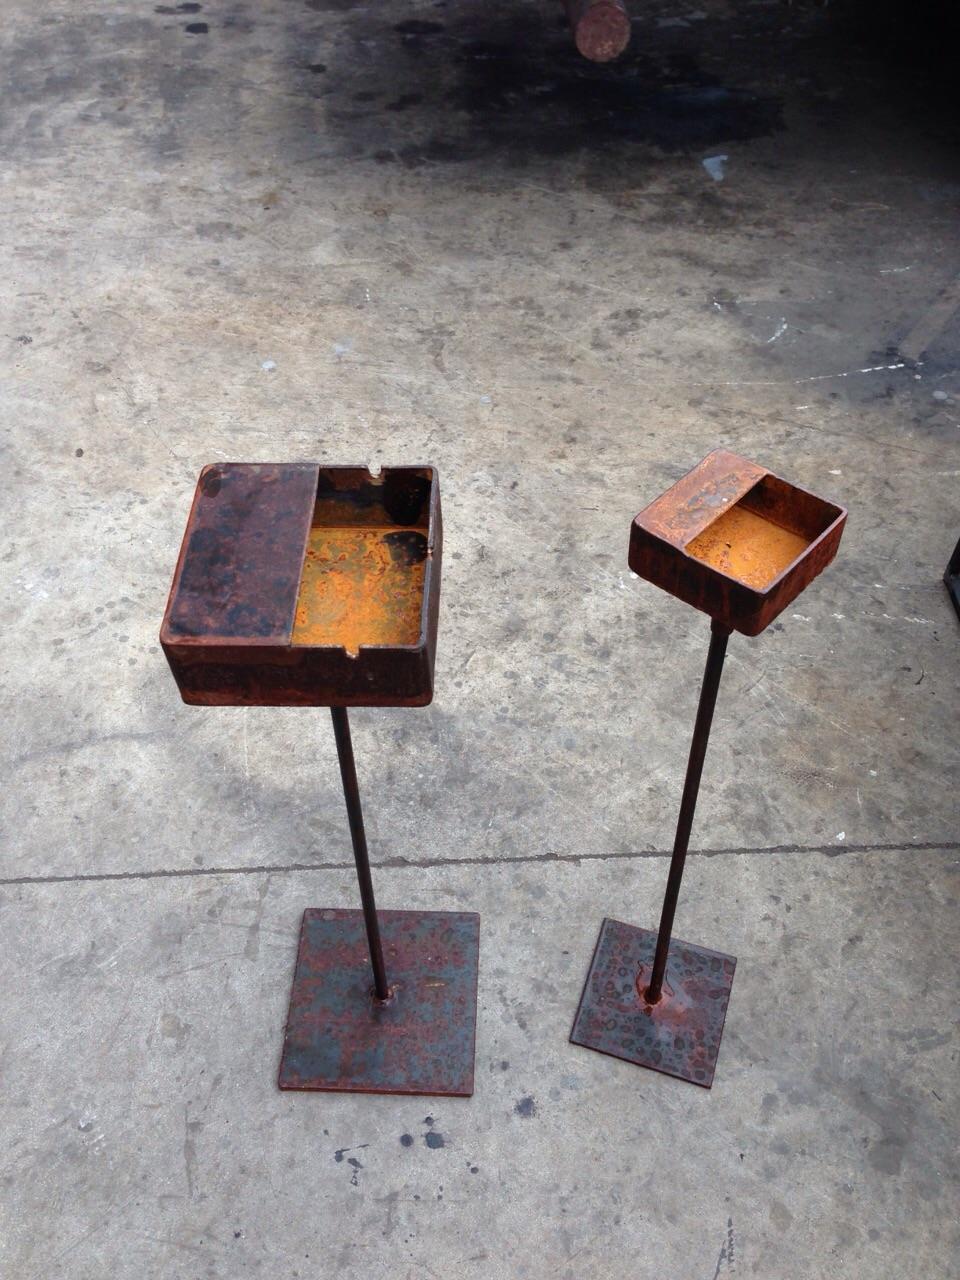 Cenicero de hierro muebles de hierro lat n zinc inox for Muebles en hierro